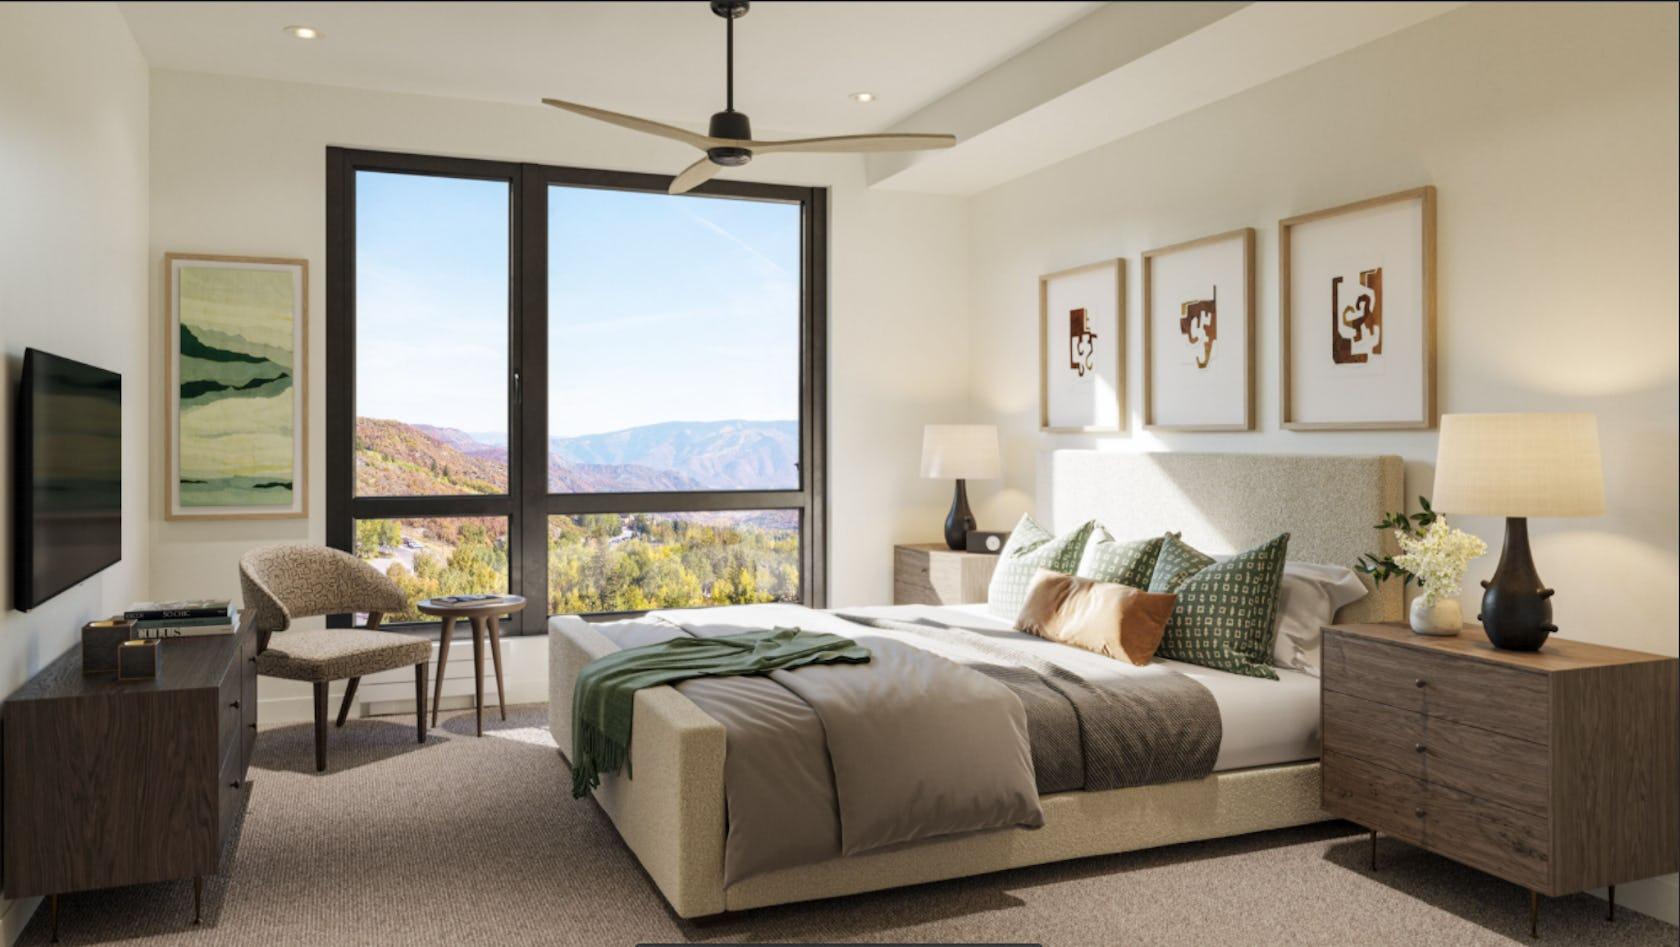 chair furniture appliance ceiling fan